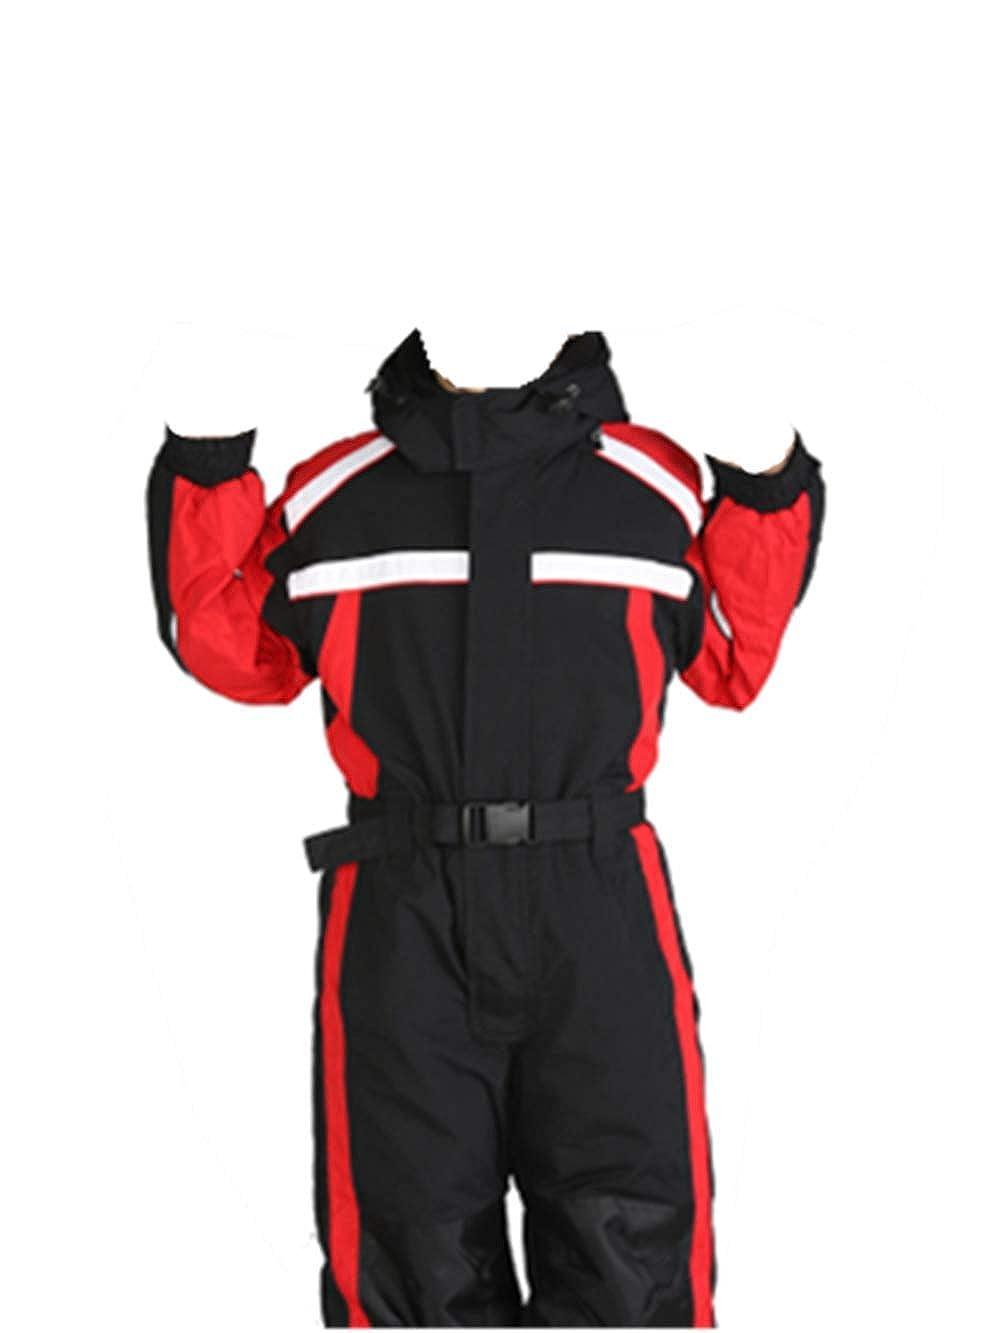 Genm0 One-Piece Snowsuit Ski Suit for Kids Waterproof Windproof Taslon Reflective Boys/Girls Winter Clothing Snow Ski Suit